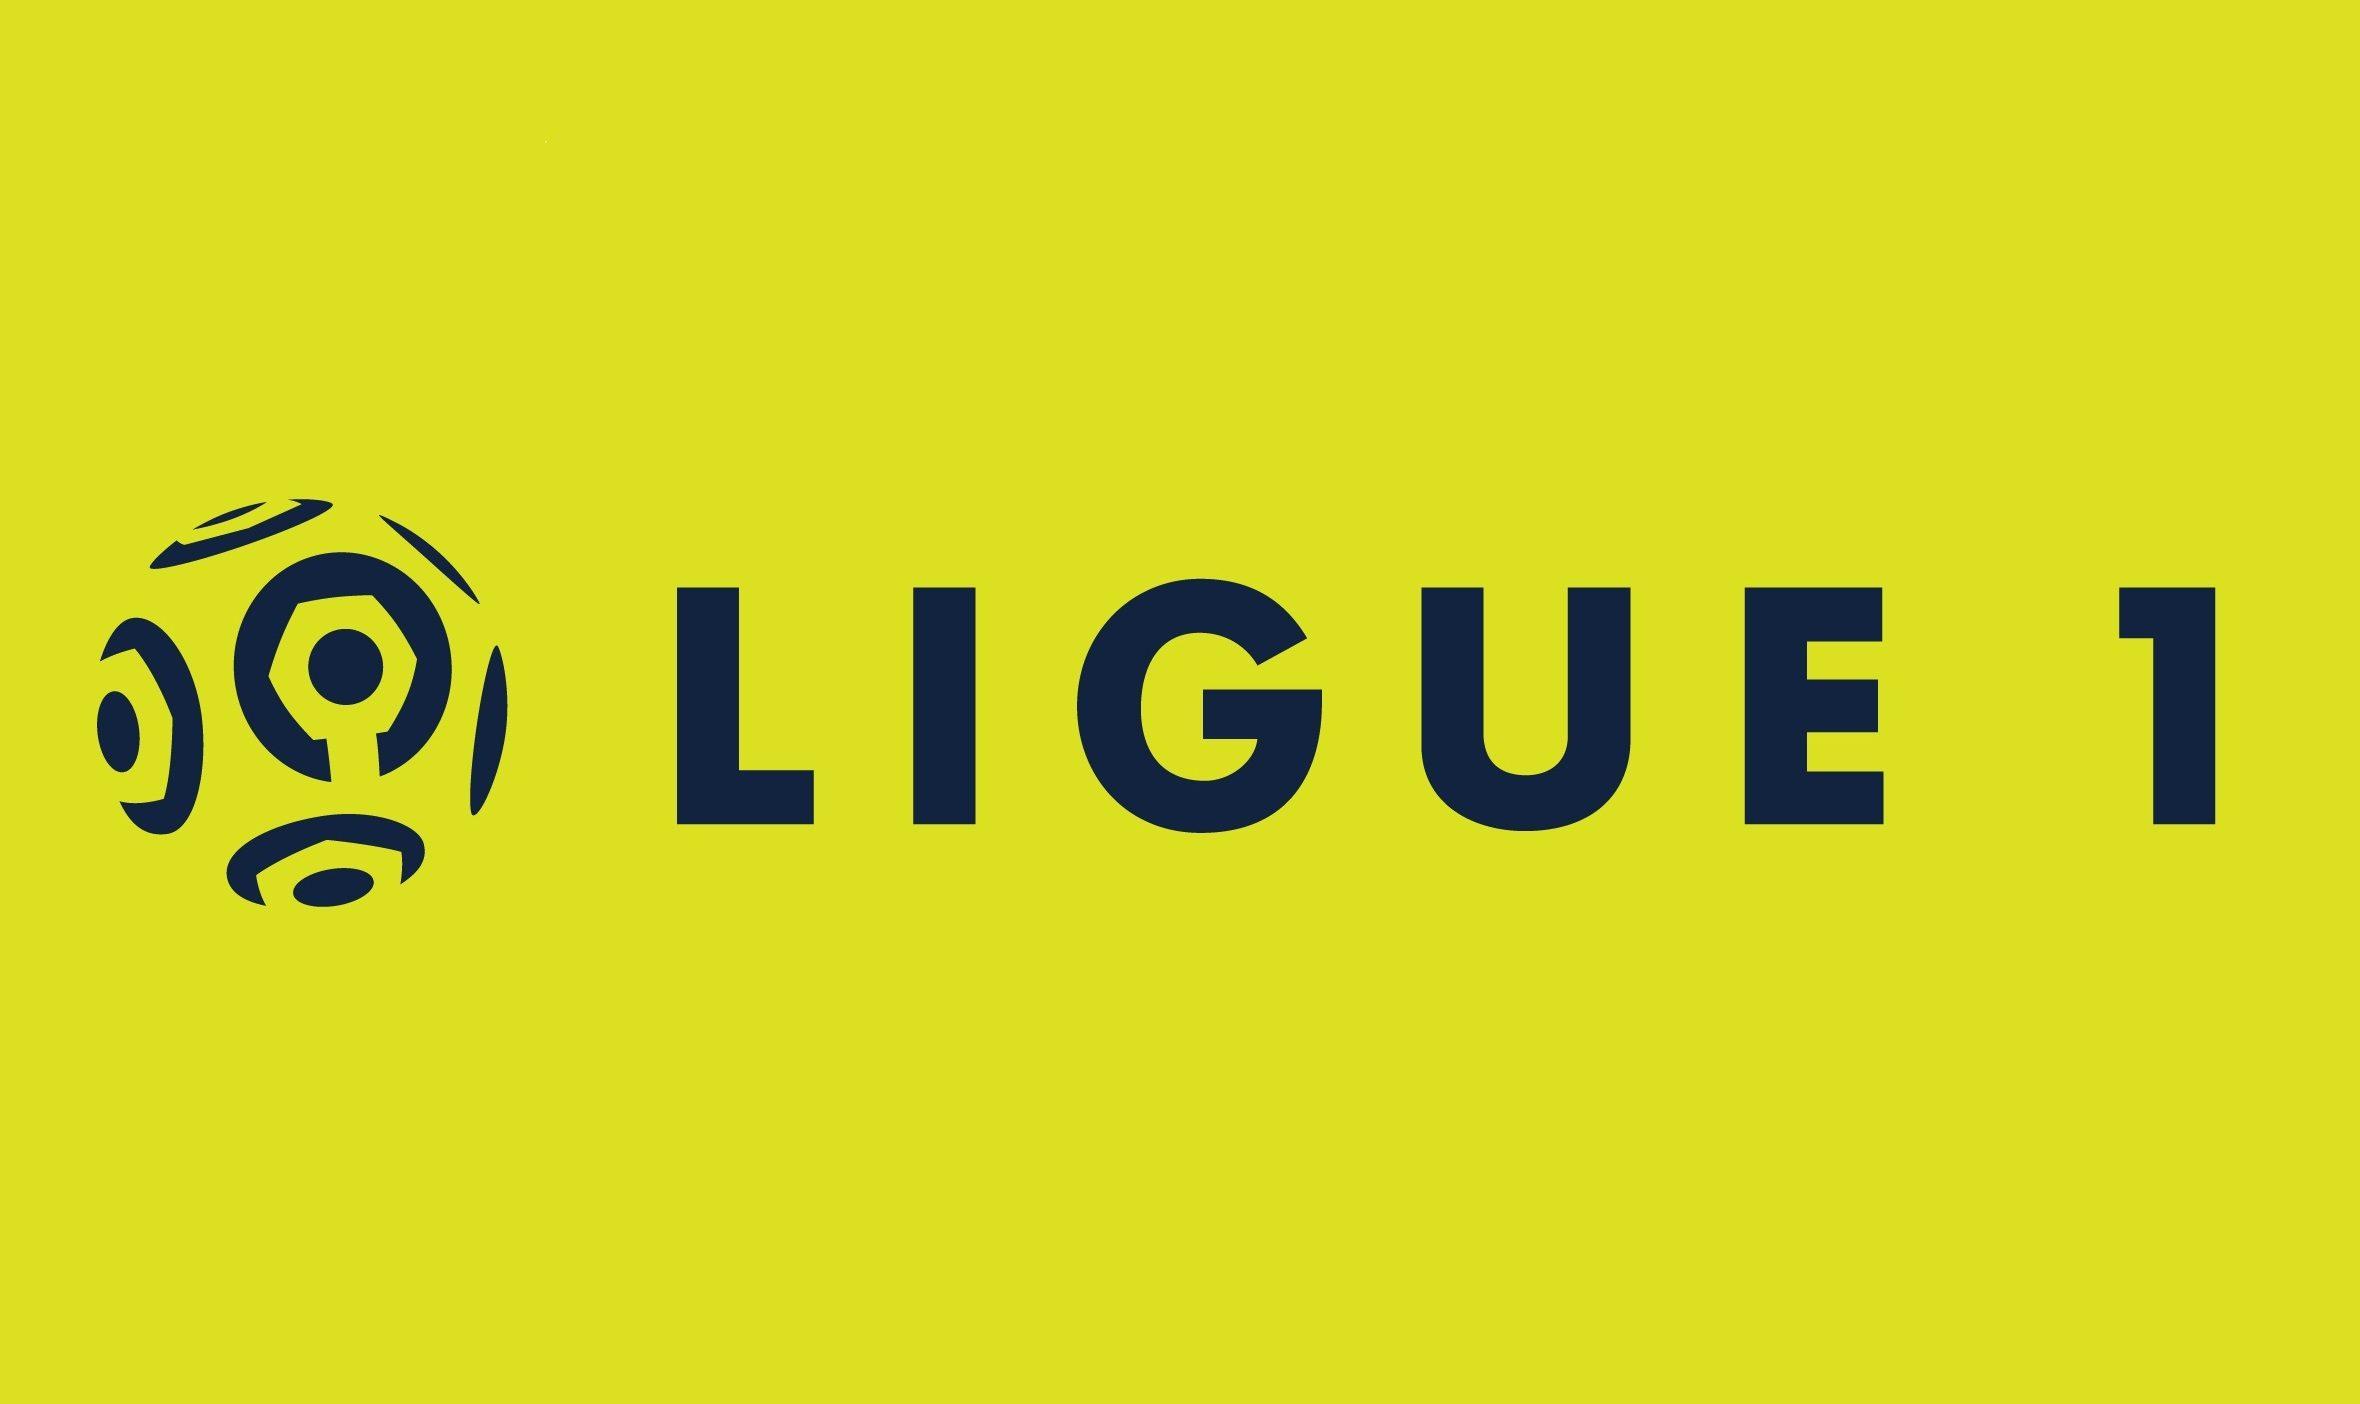 Pronostici Ligue 1 23-24 Febbraio: Schedina 26ª Giornata Campionato Francese